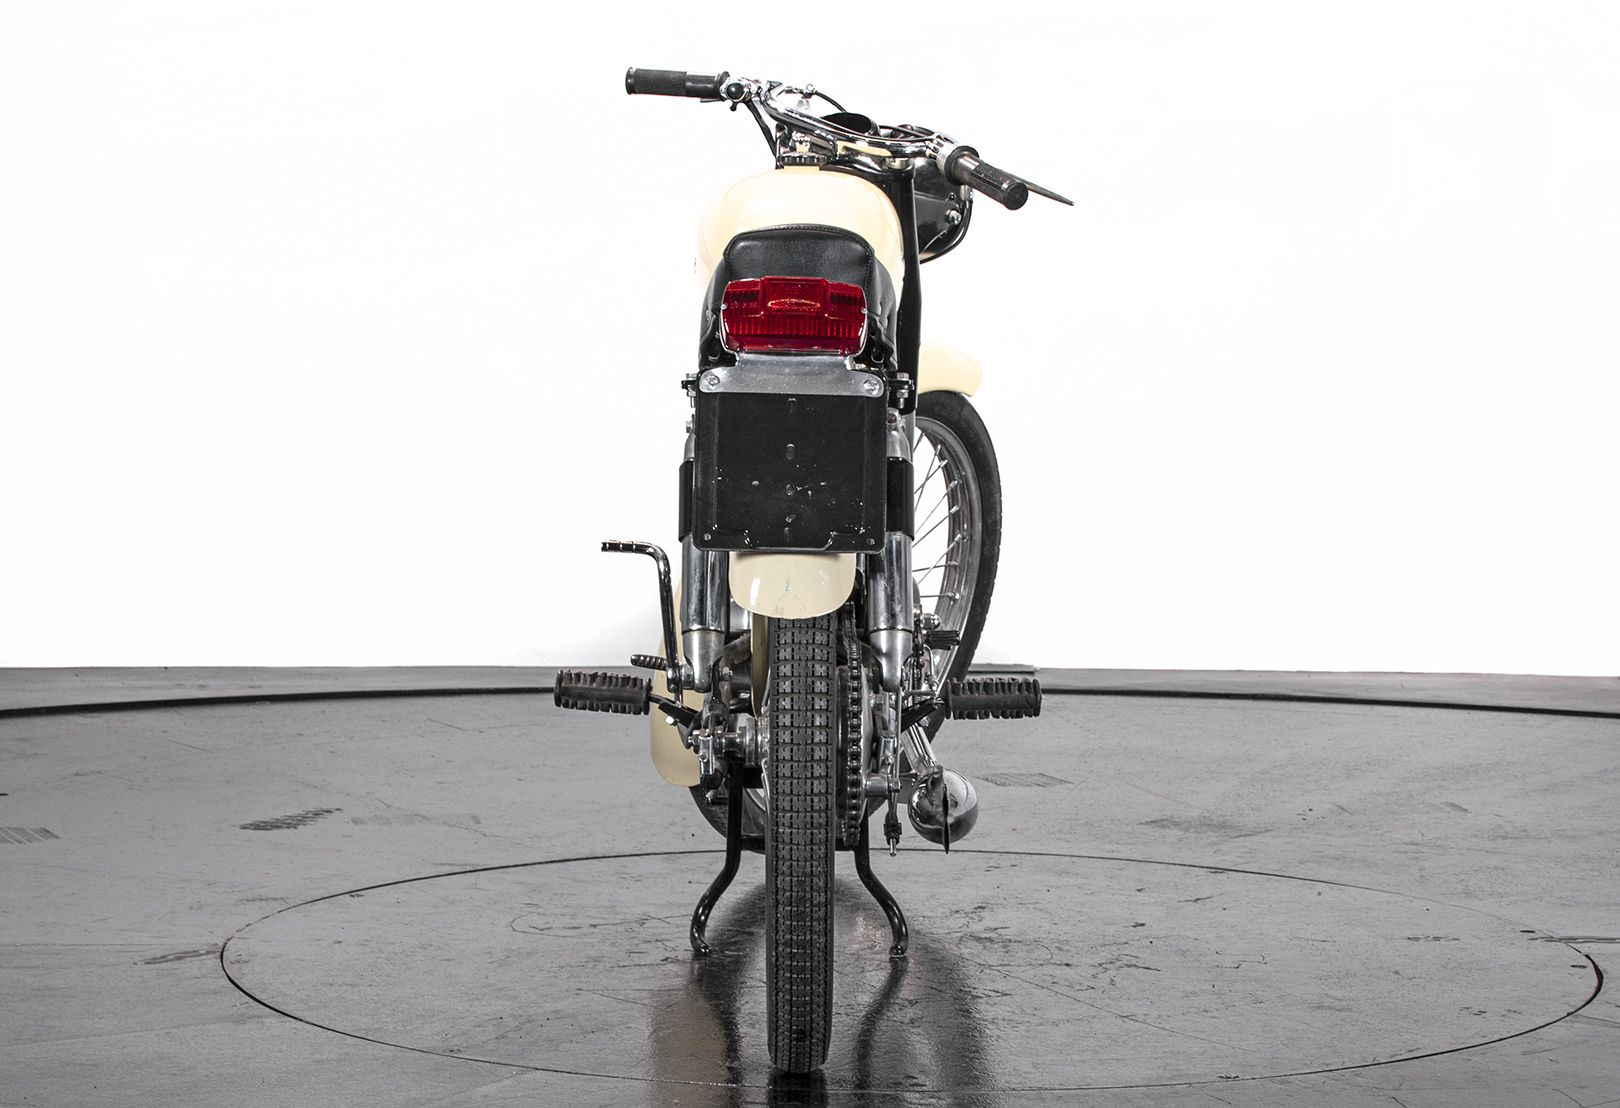 1954 Laverda 75 Sport 61423